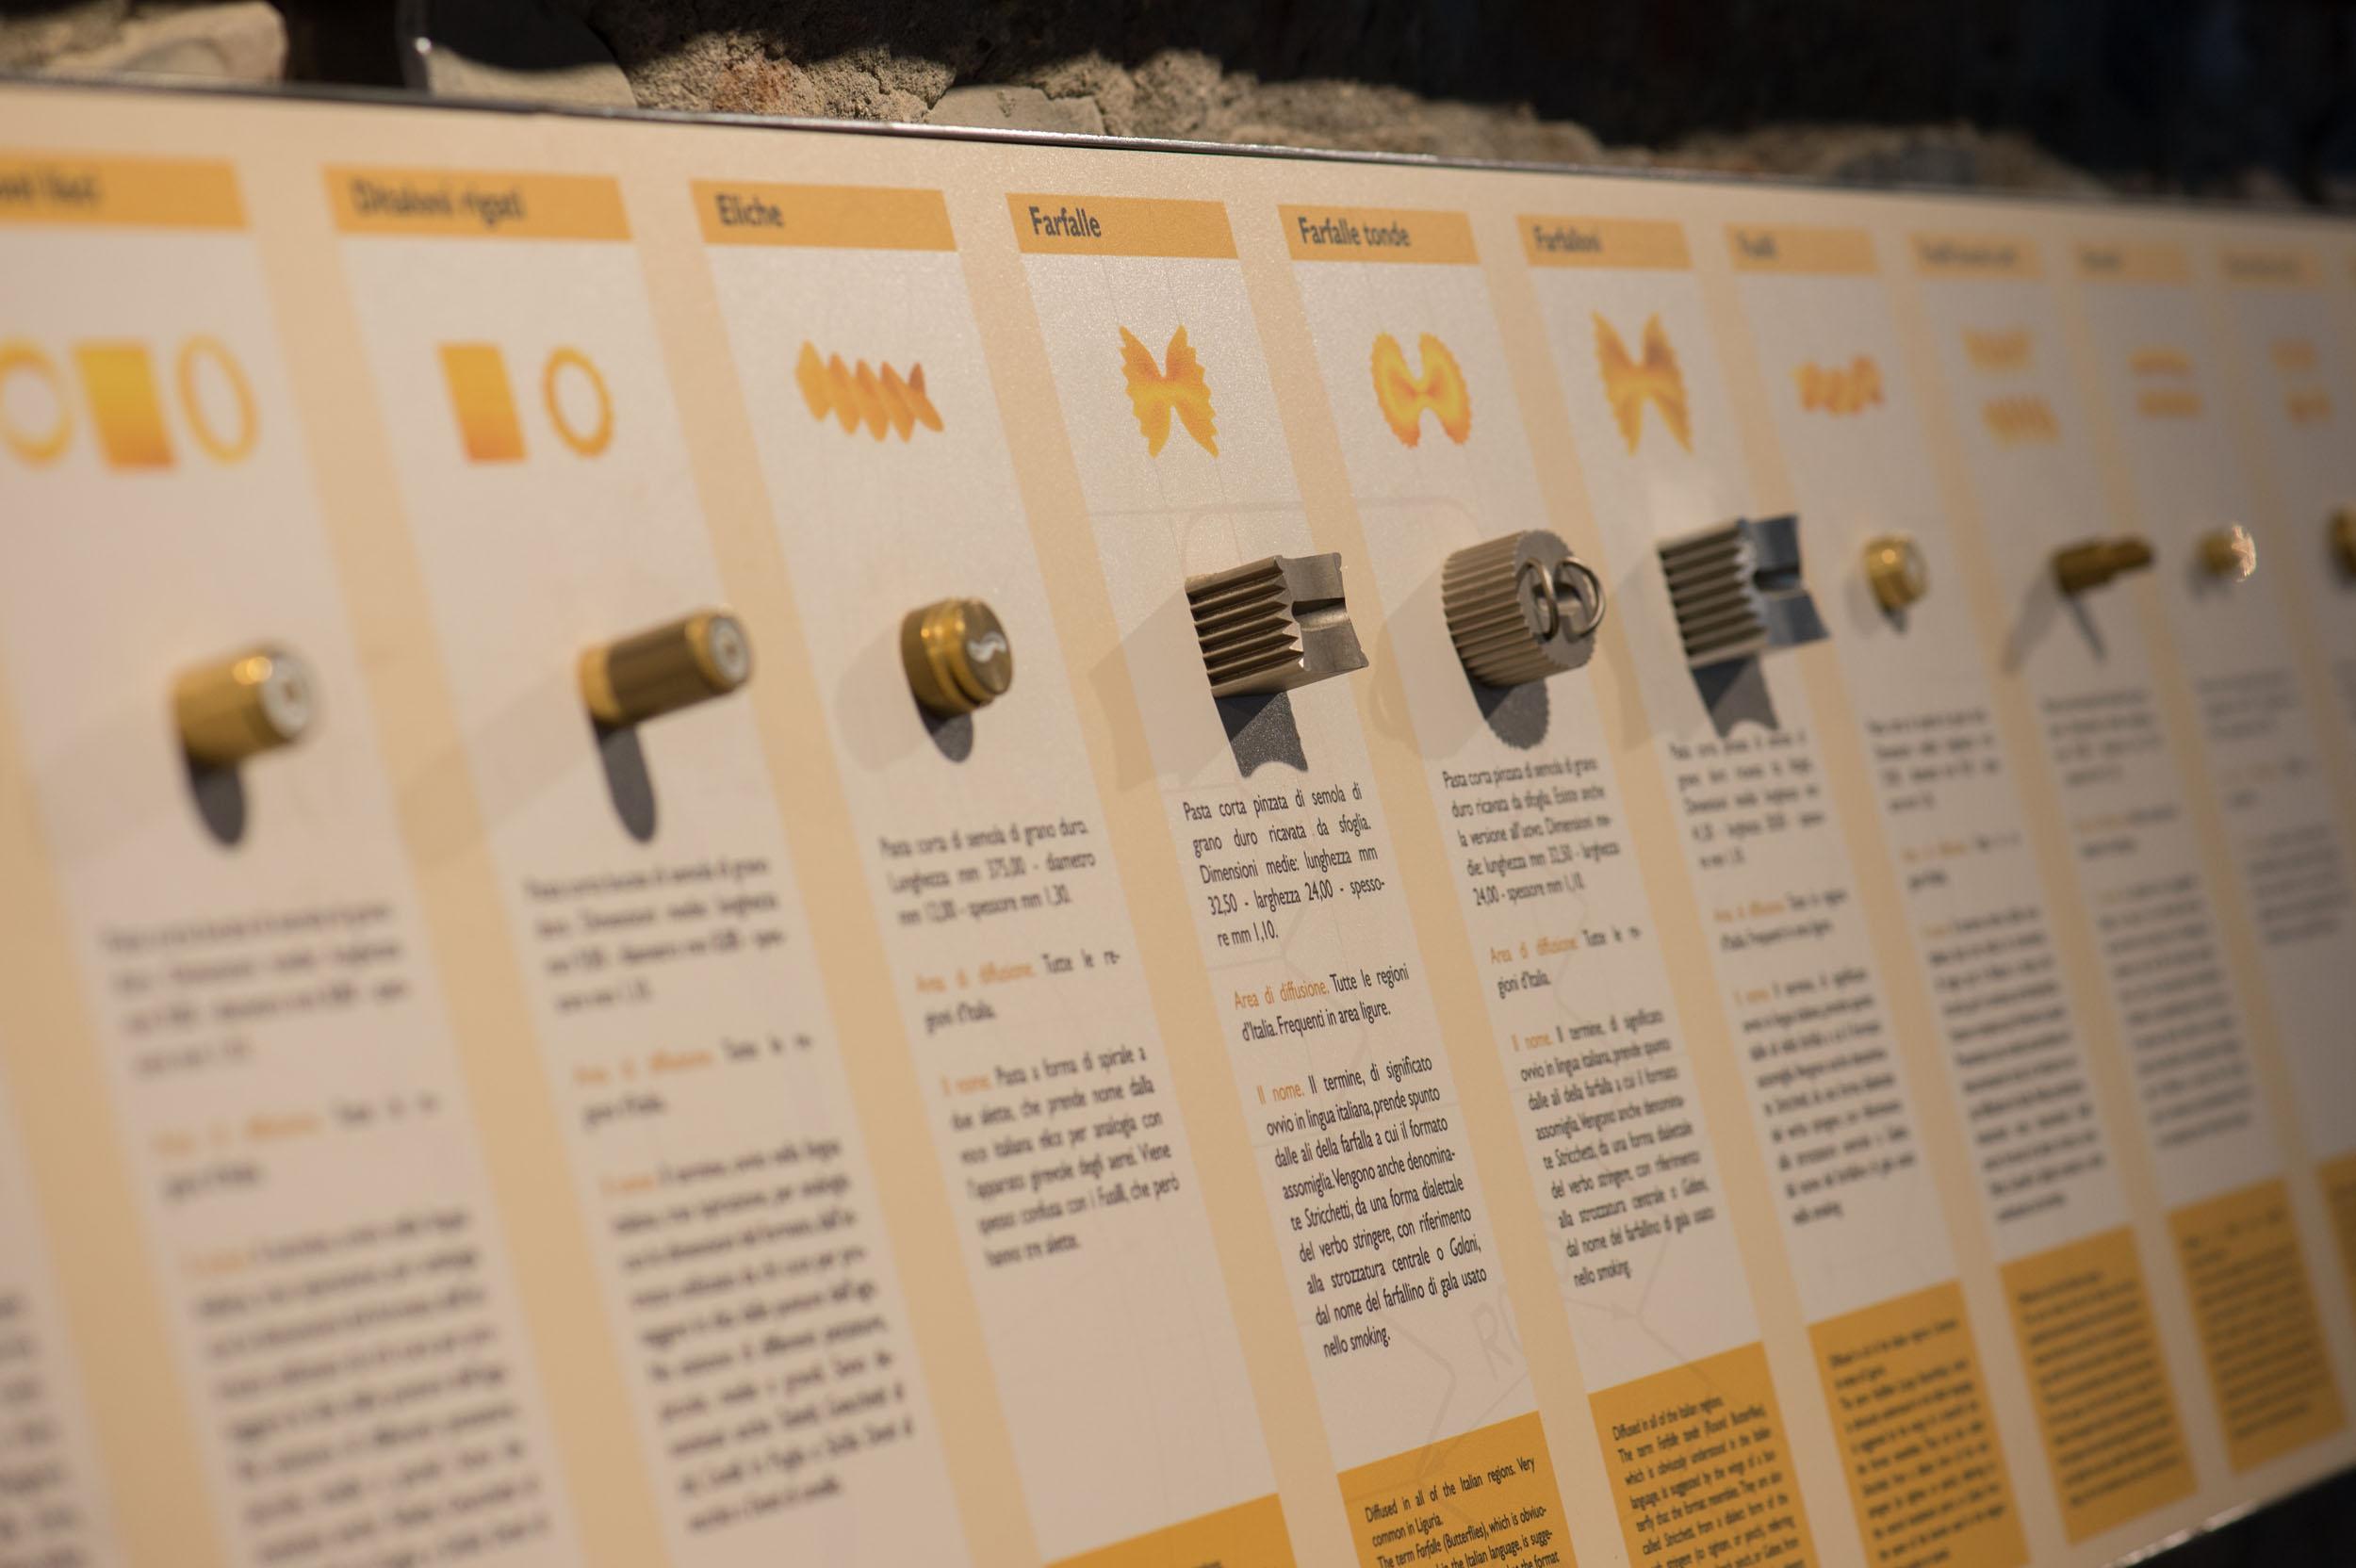 Pasta Museum in Collecchio (PR), interior n. 5 (Picture by L. Rossi)